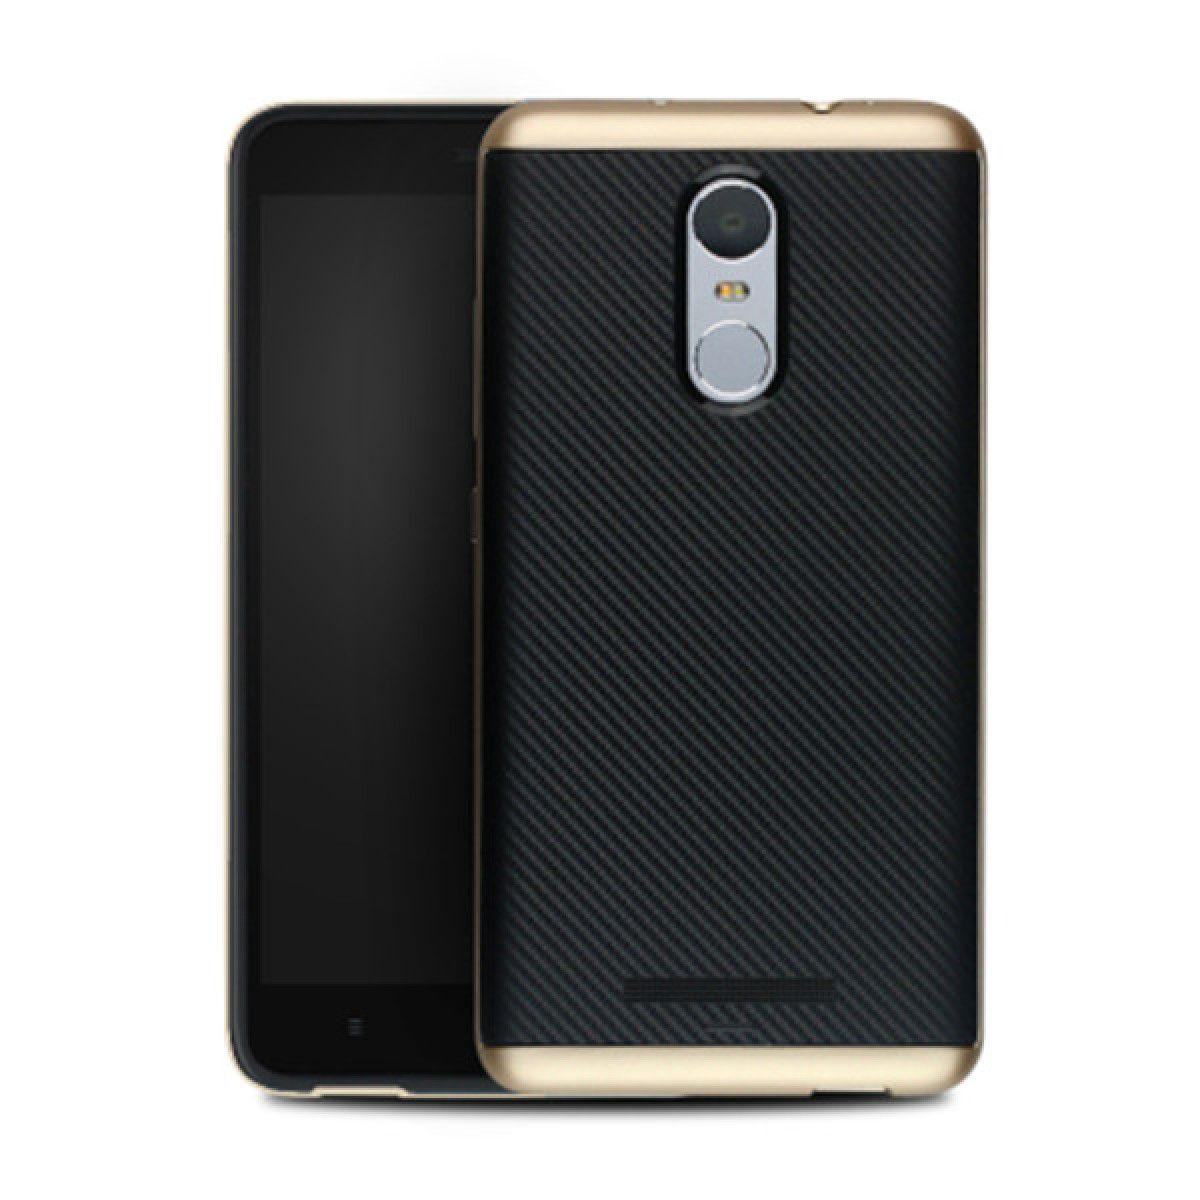 Ipaky Premium Tpu Pc Hybird Bumper Back Cover For Xiaomi Mi4i Price Case Mi Max Gold Redmi Note 3 Available At